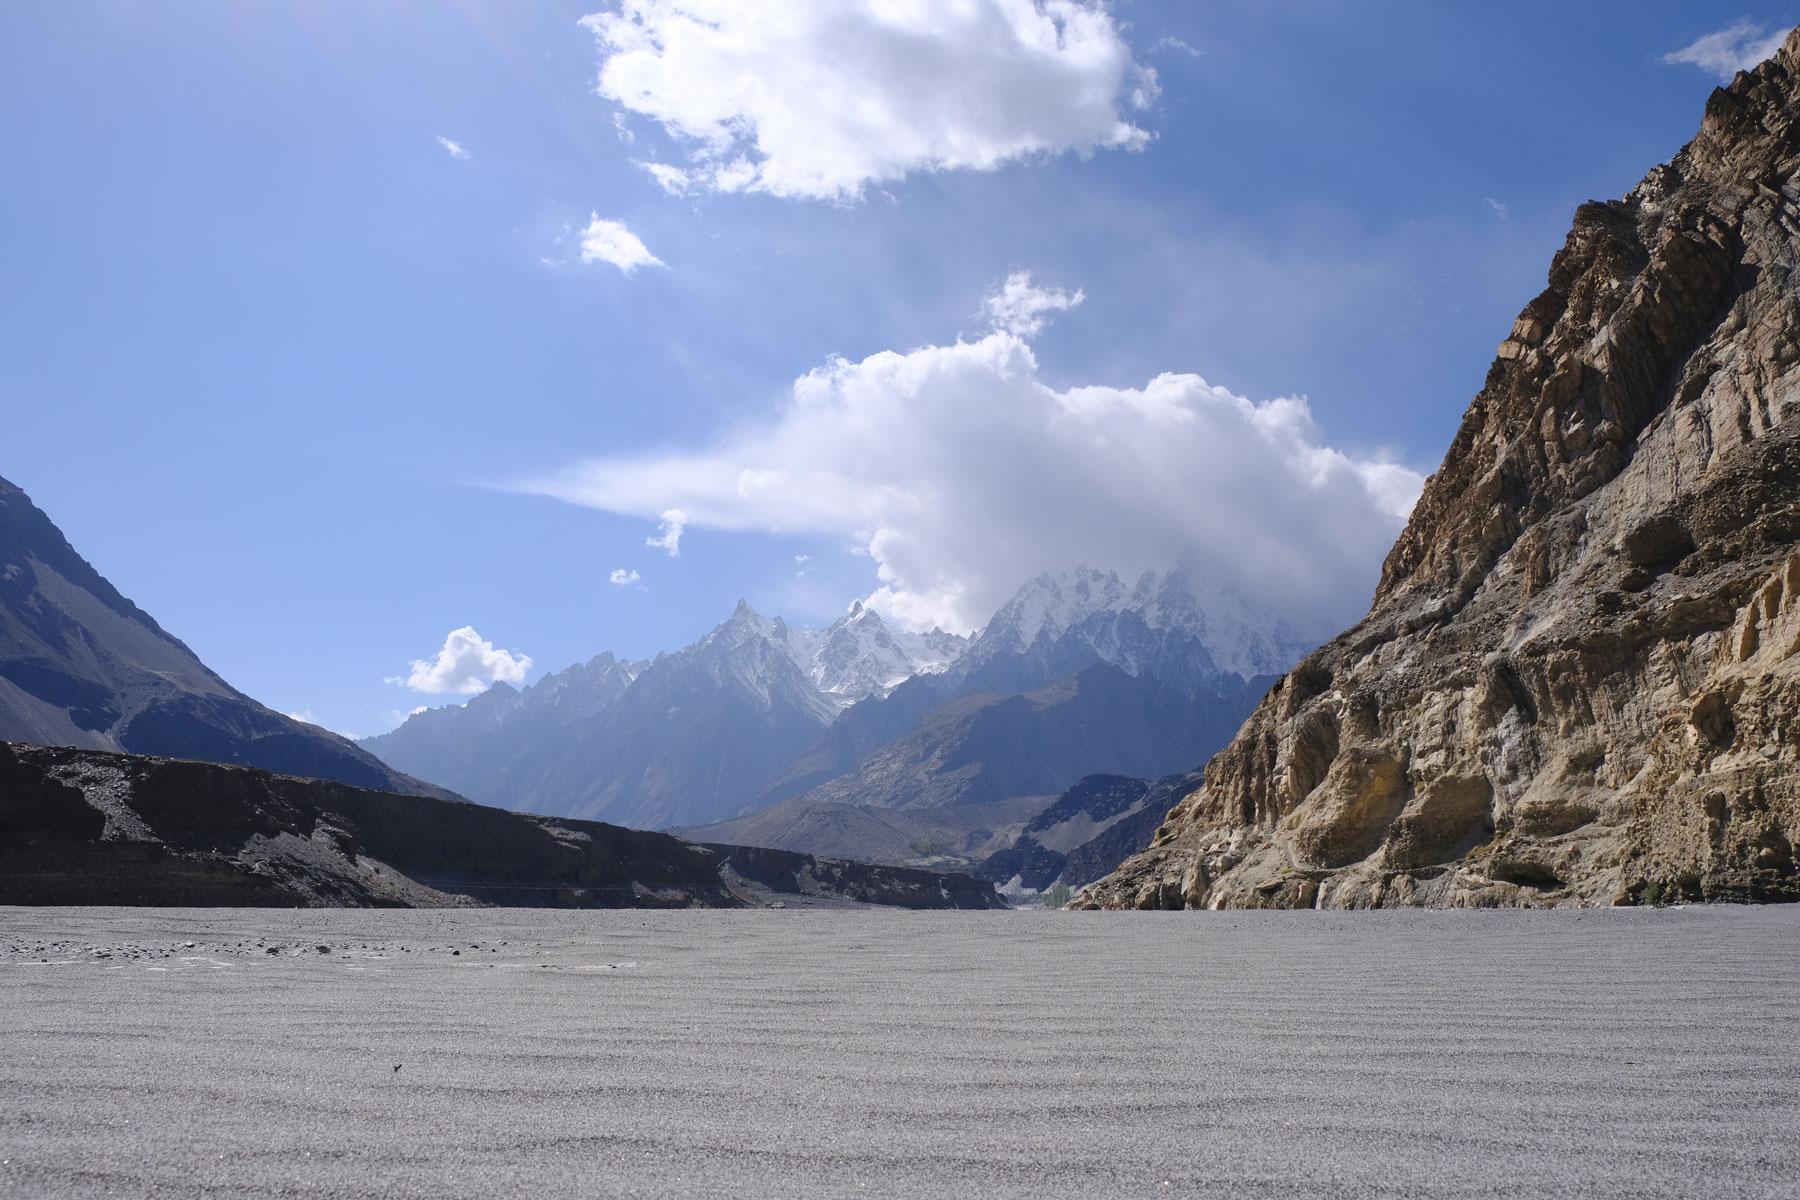 Sandiges Flussbett des Hunza-Flusses.